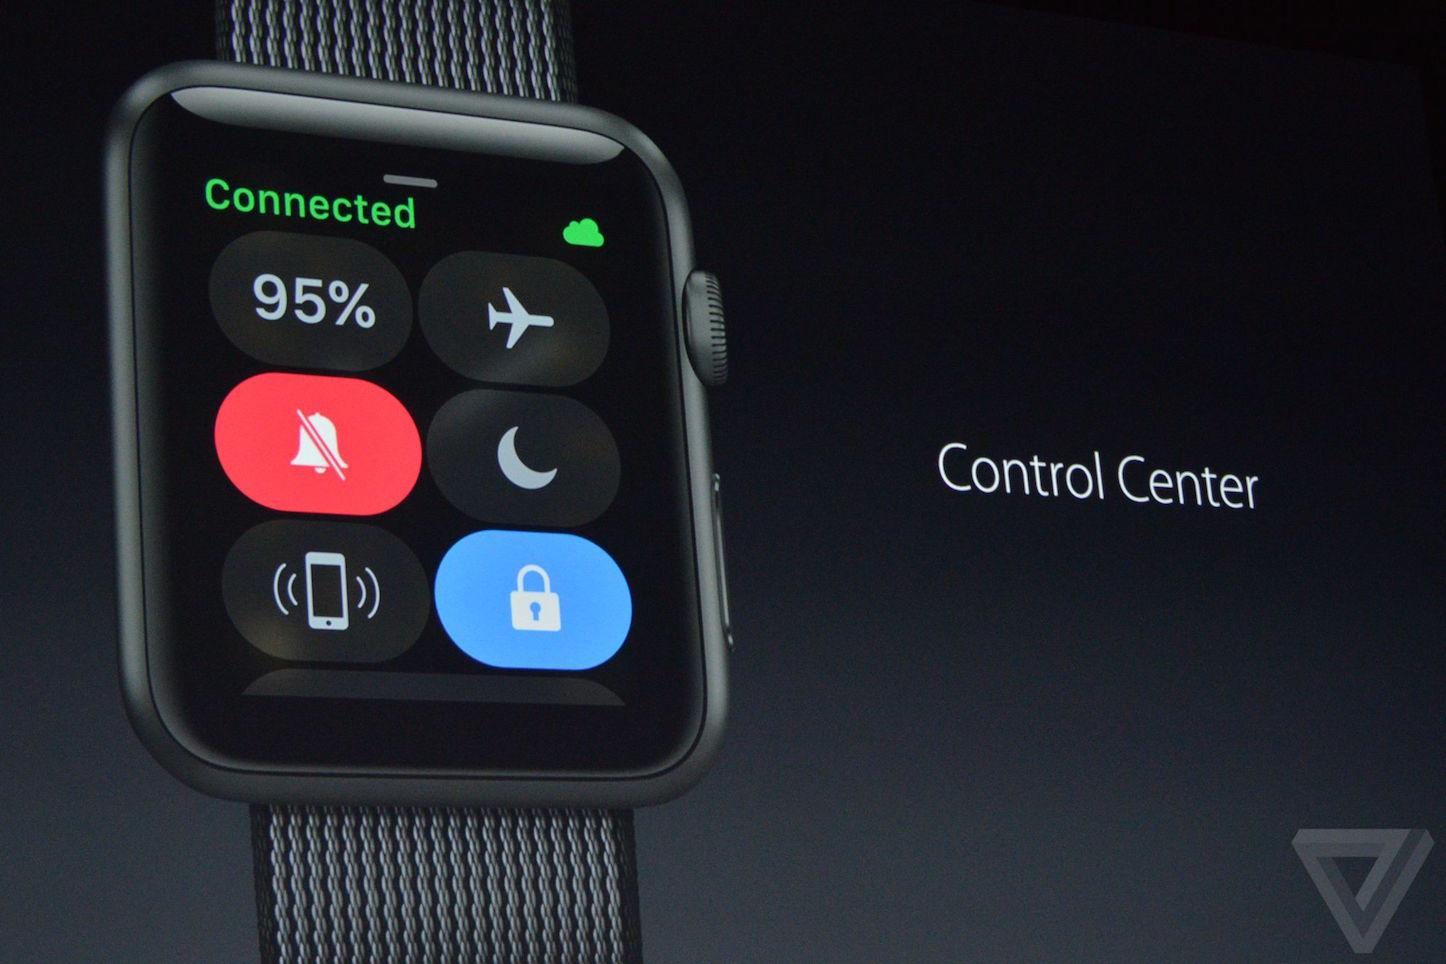 Apple wwdc WatchOS 3 Control Center